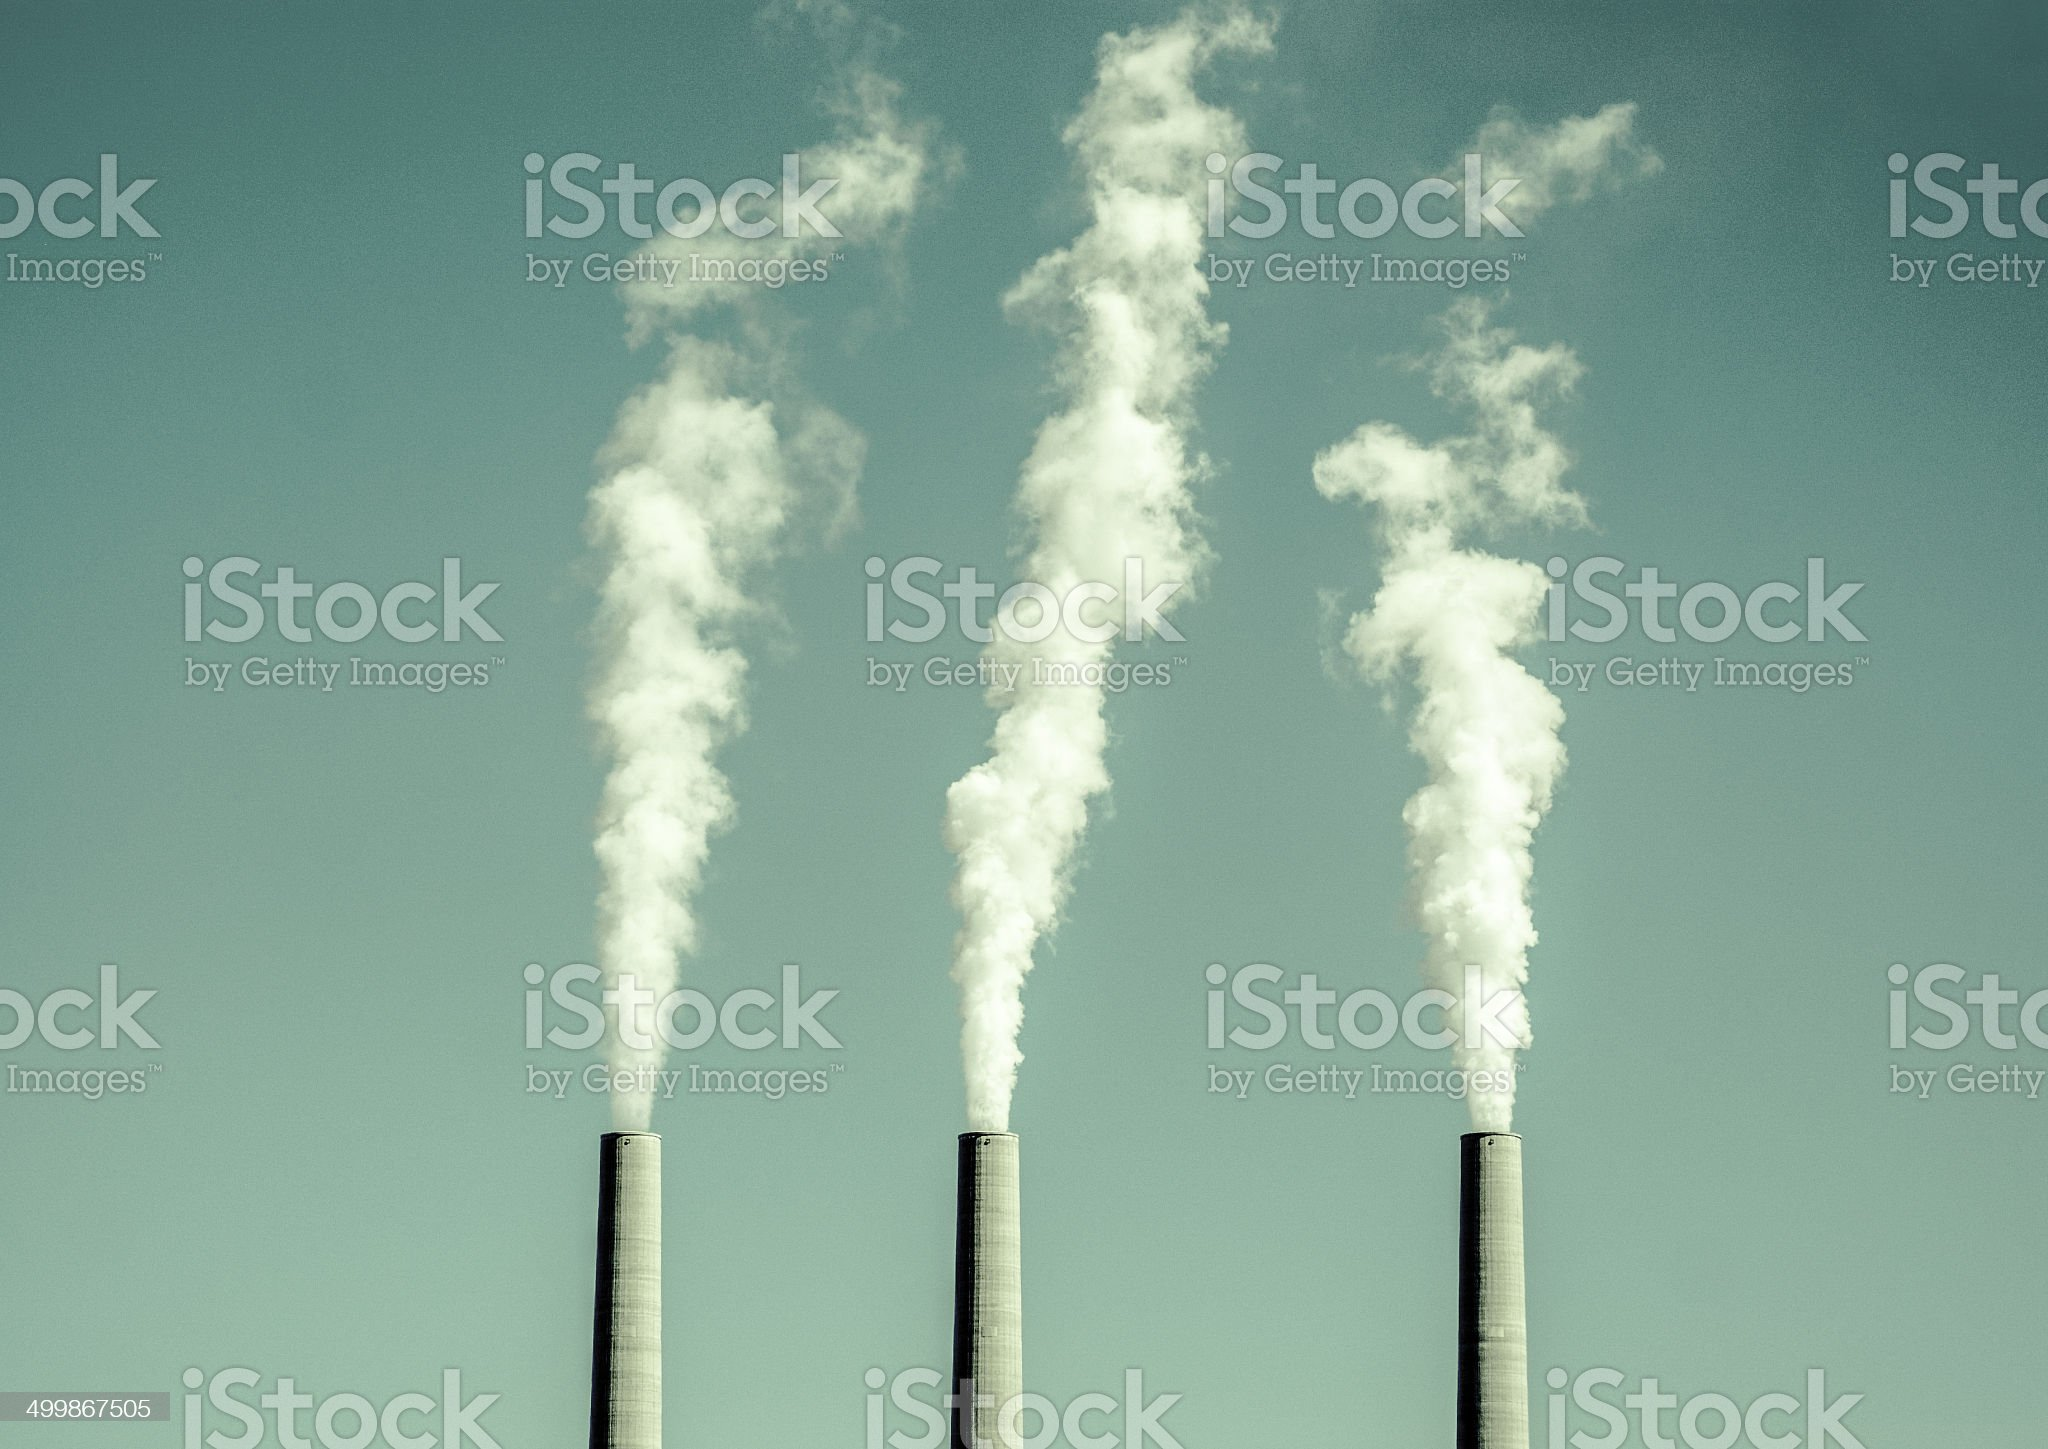 retro smoke stack sky royalty-free stock photo